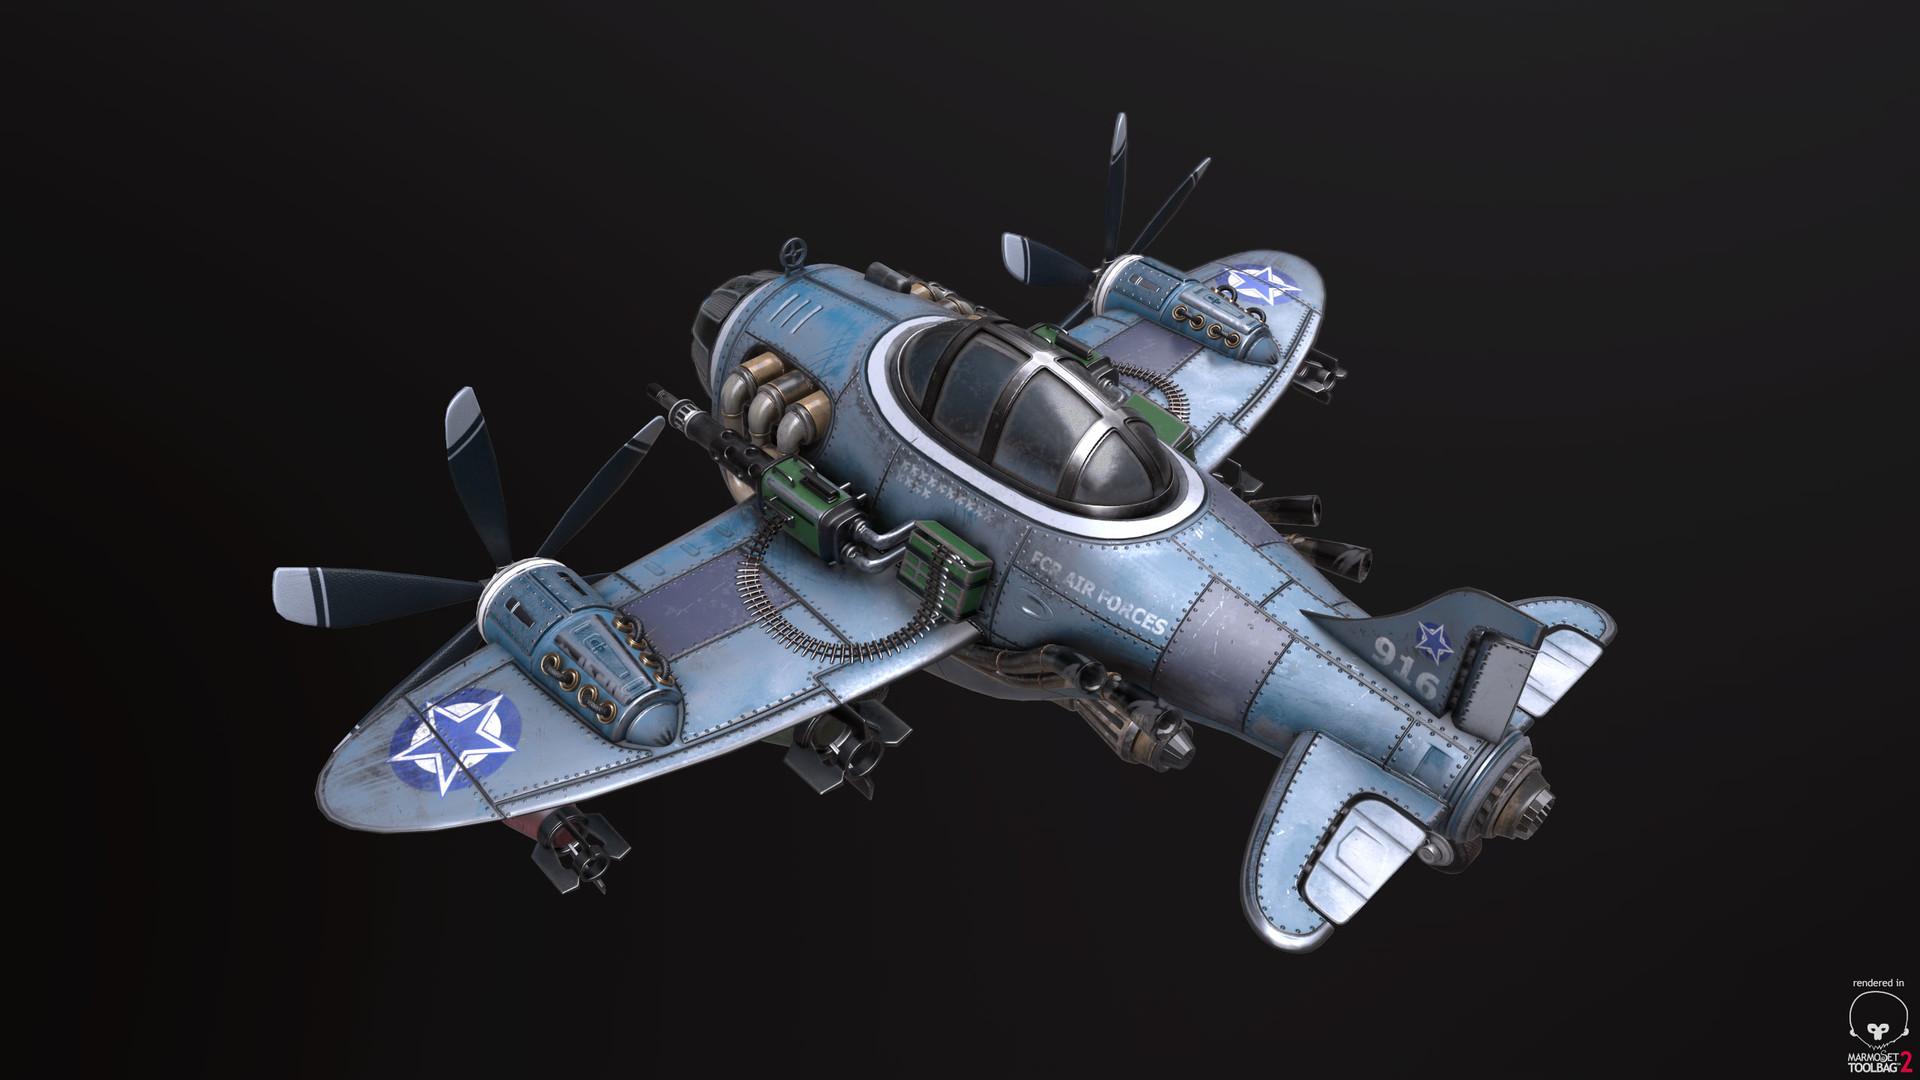 Andrey lukashov planes11